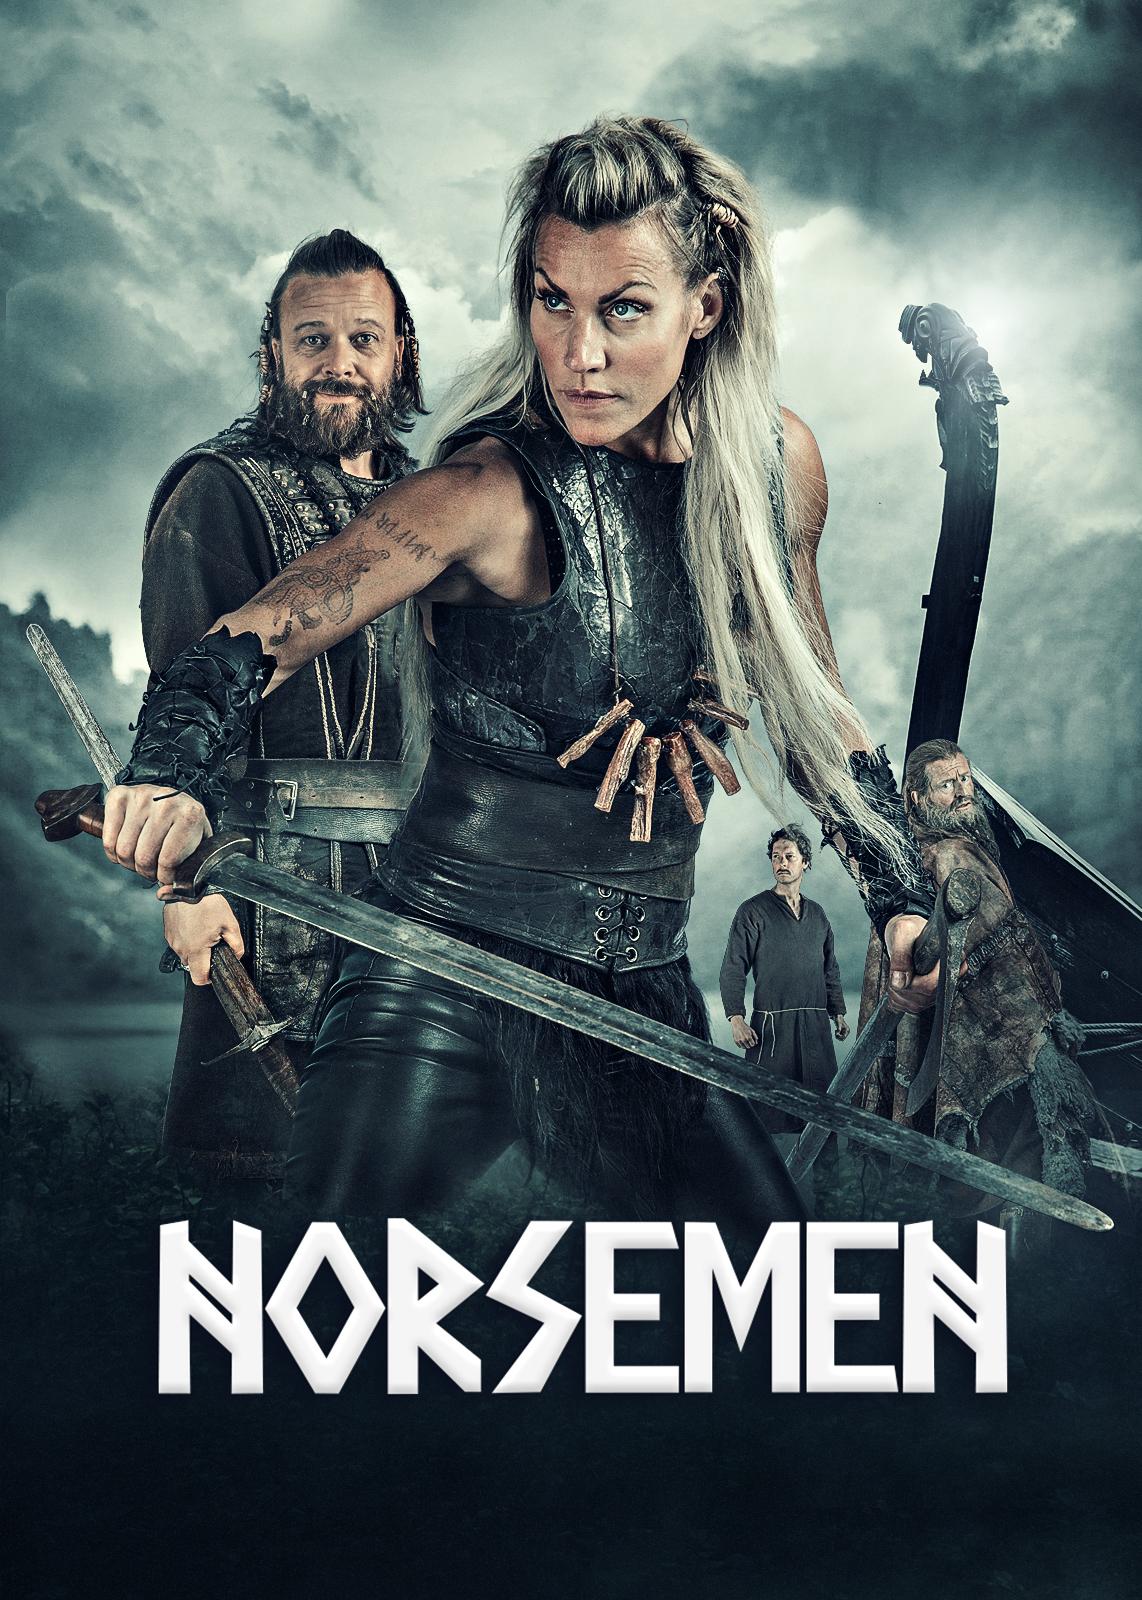 Trond Fausa, Kåre Conradi, Henrik Mestad, and Silje Torp in Norsemen (2016)